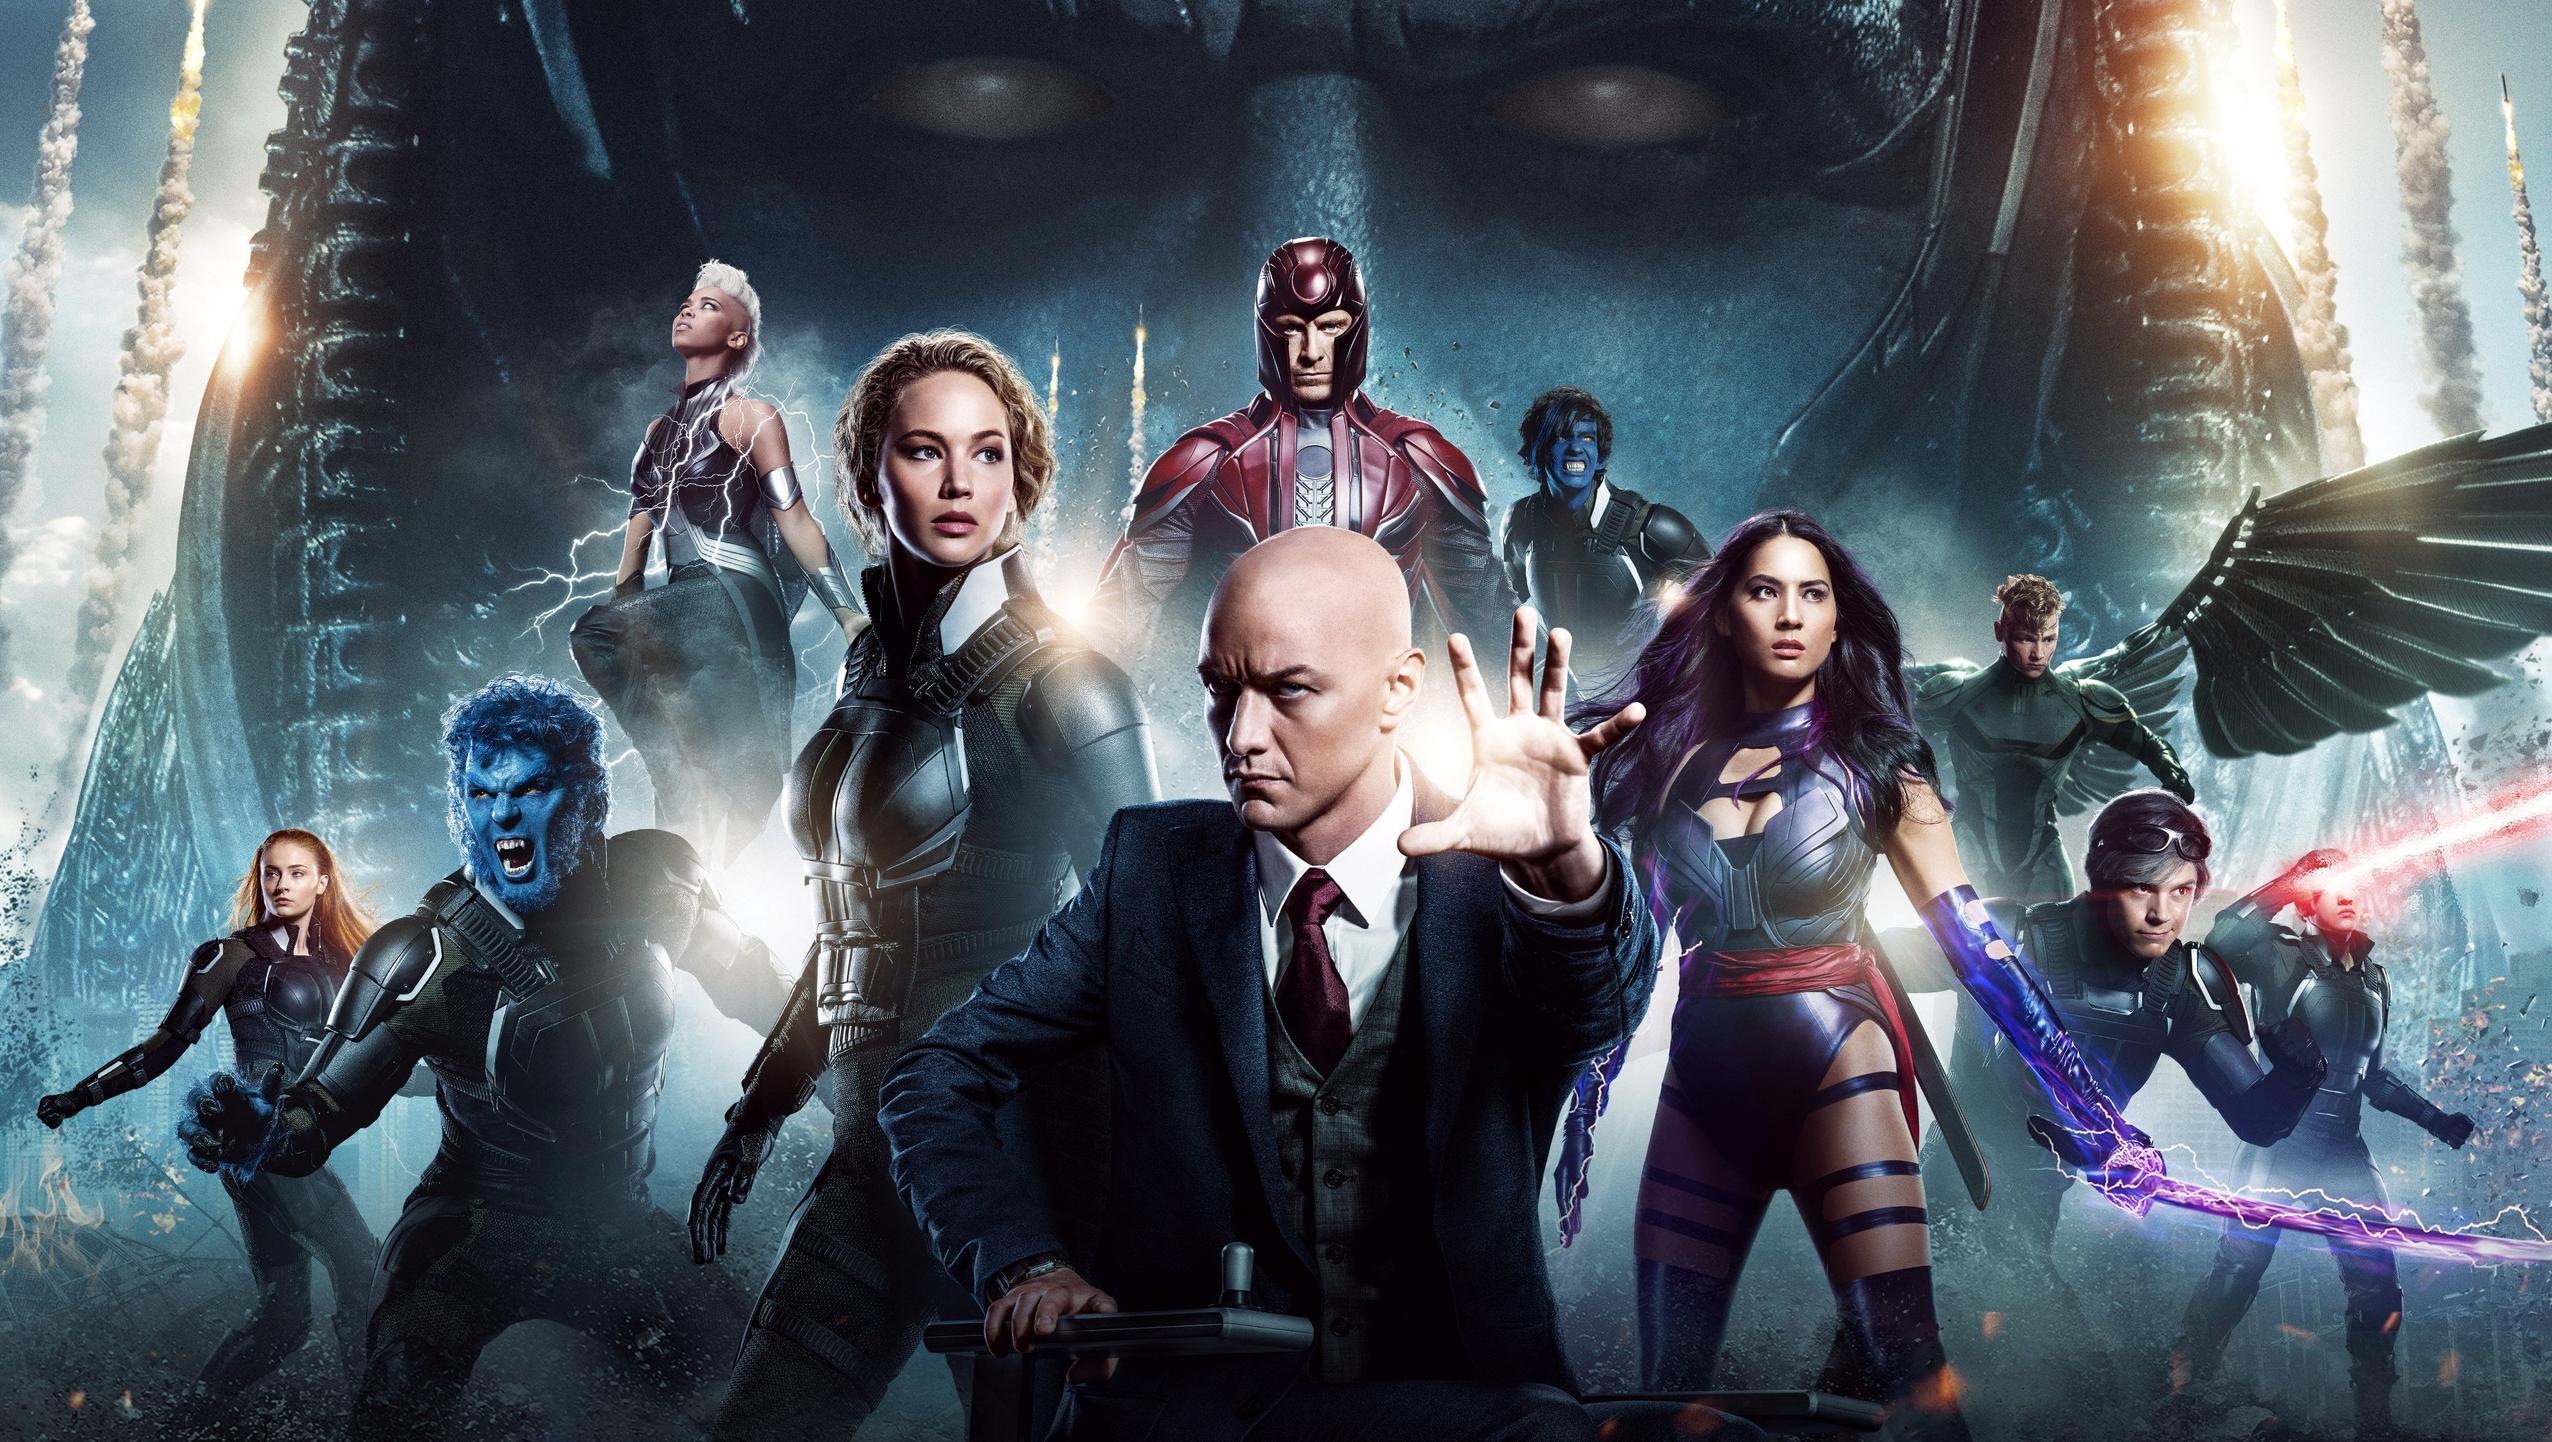 X Men Apocalypse 2016 Desktop Wallpaper Moviemania 2552x1442